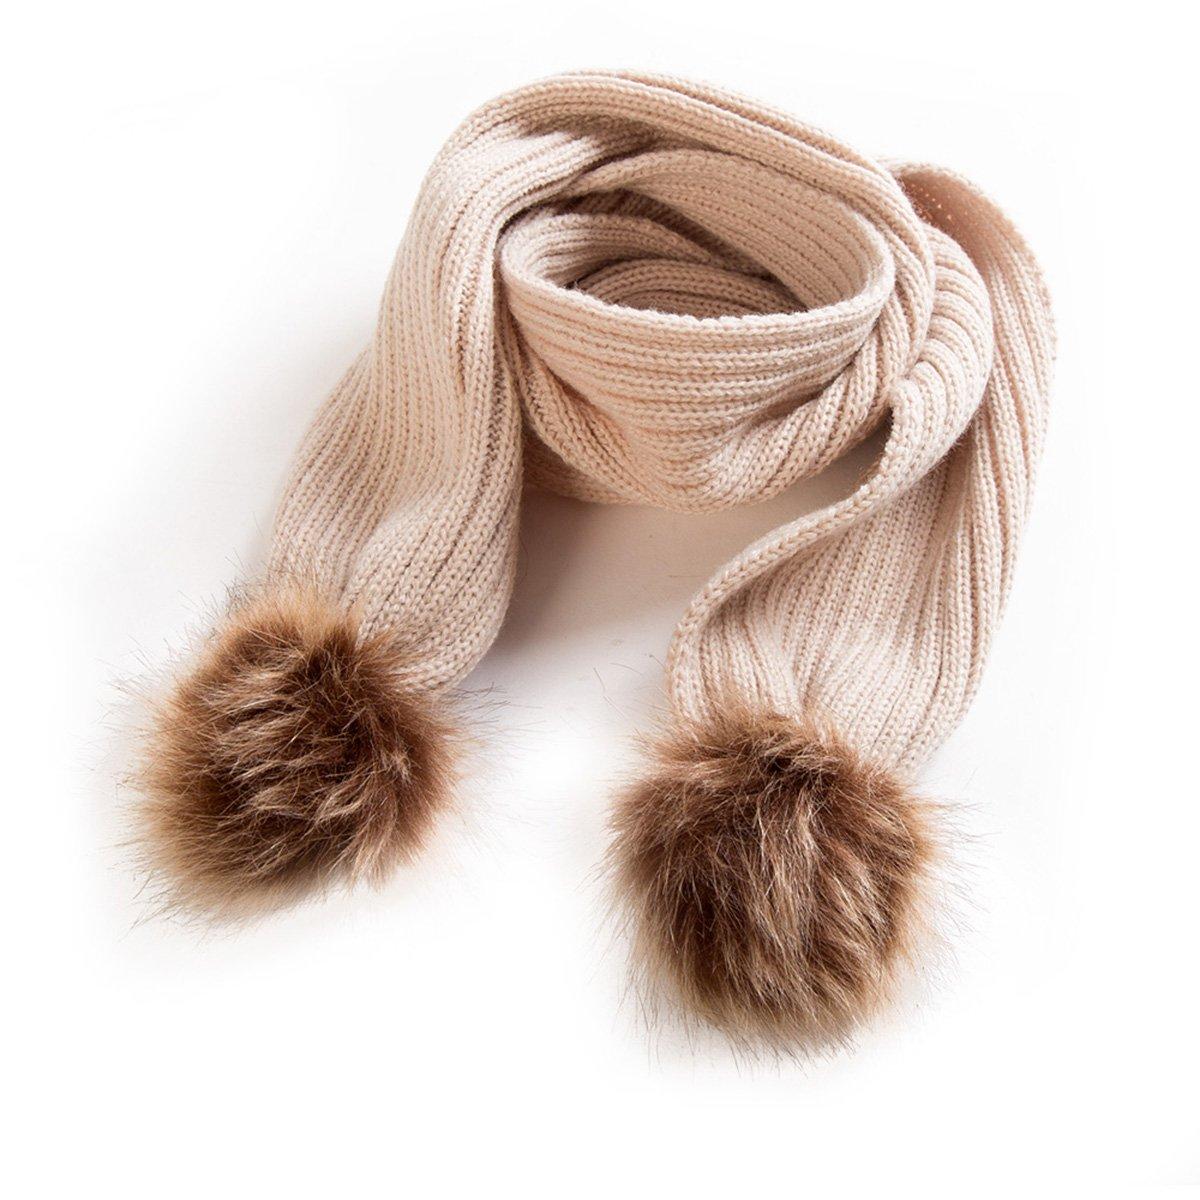 0-24M Baby Boy Girl Double Pom Pom Fur Ball Knitted Crochet Scarf Winter Neckerchief